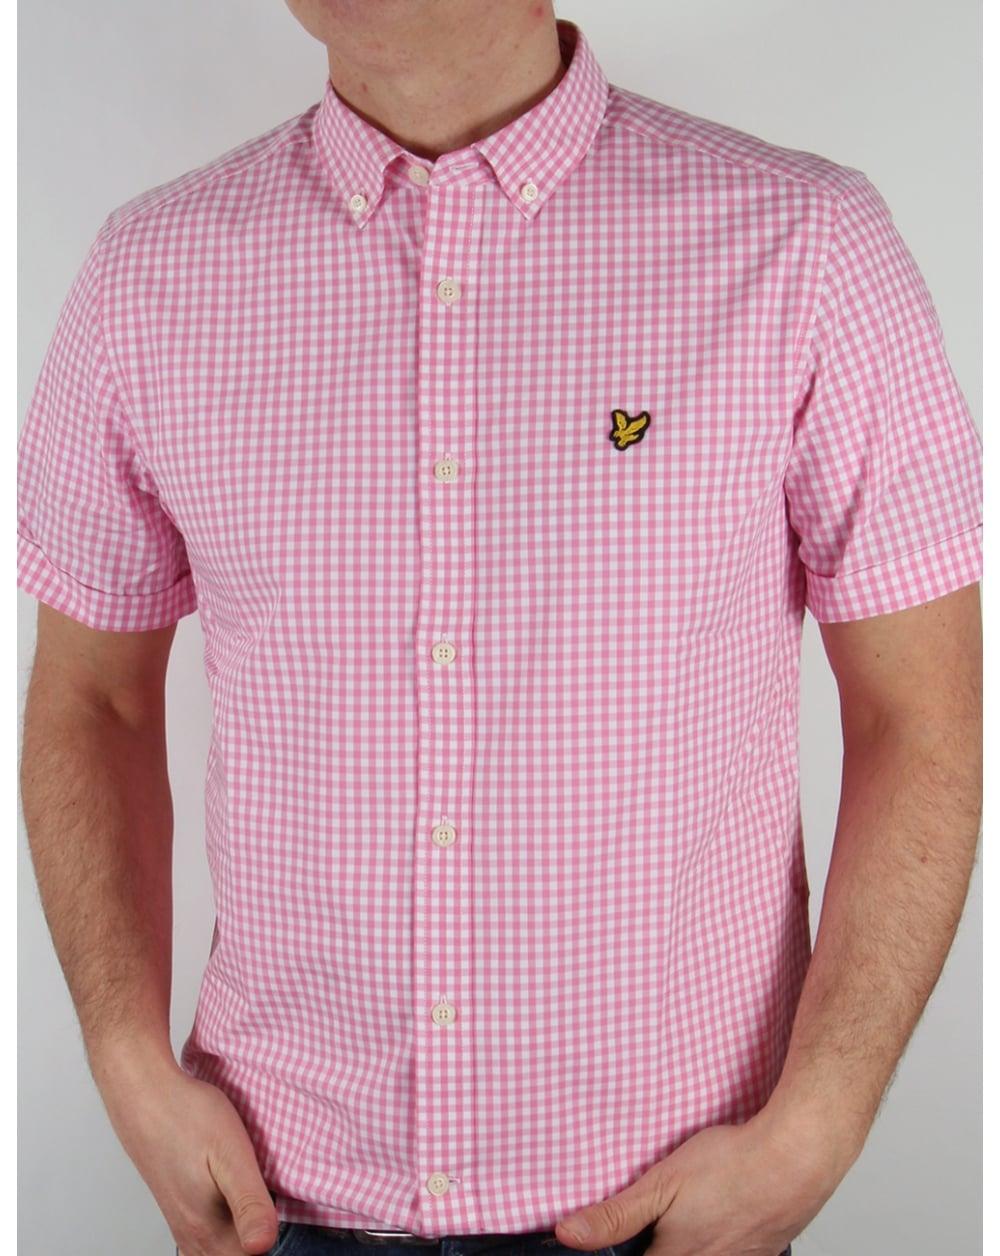 Lyle And Scott Short Sleeve Gingham Check Shirt Summer Pink